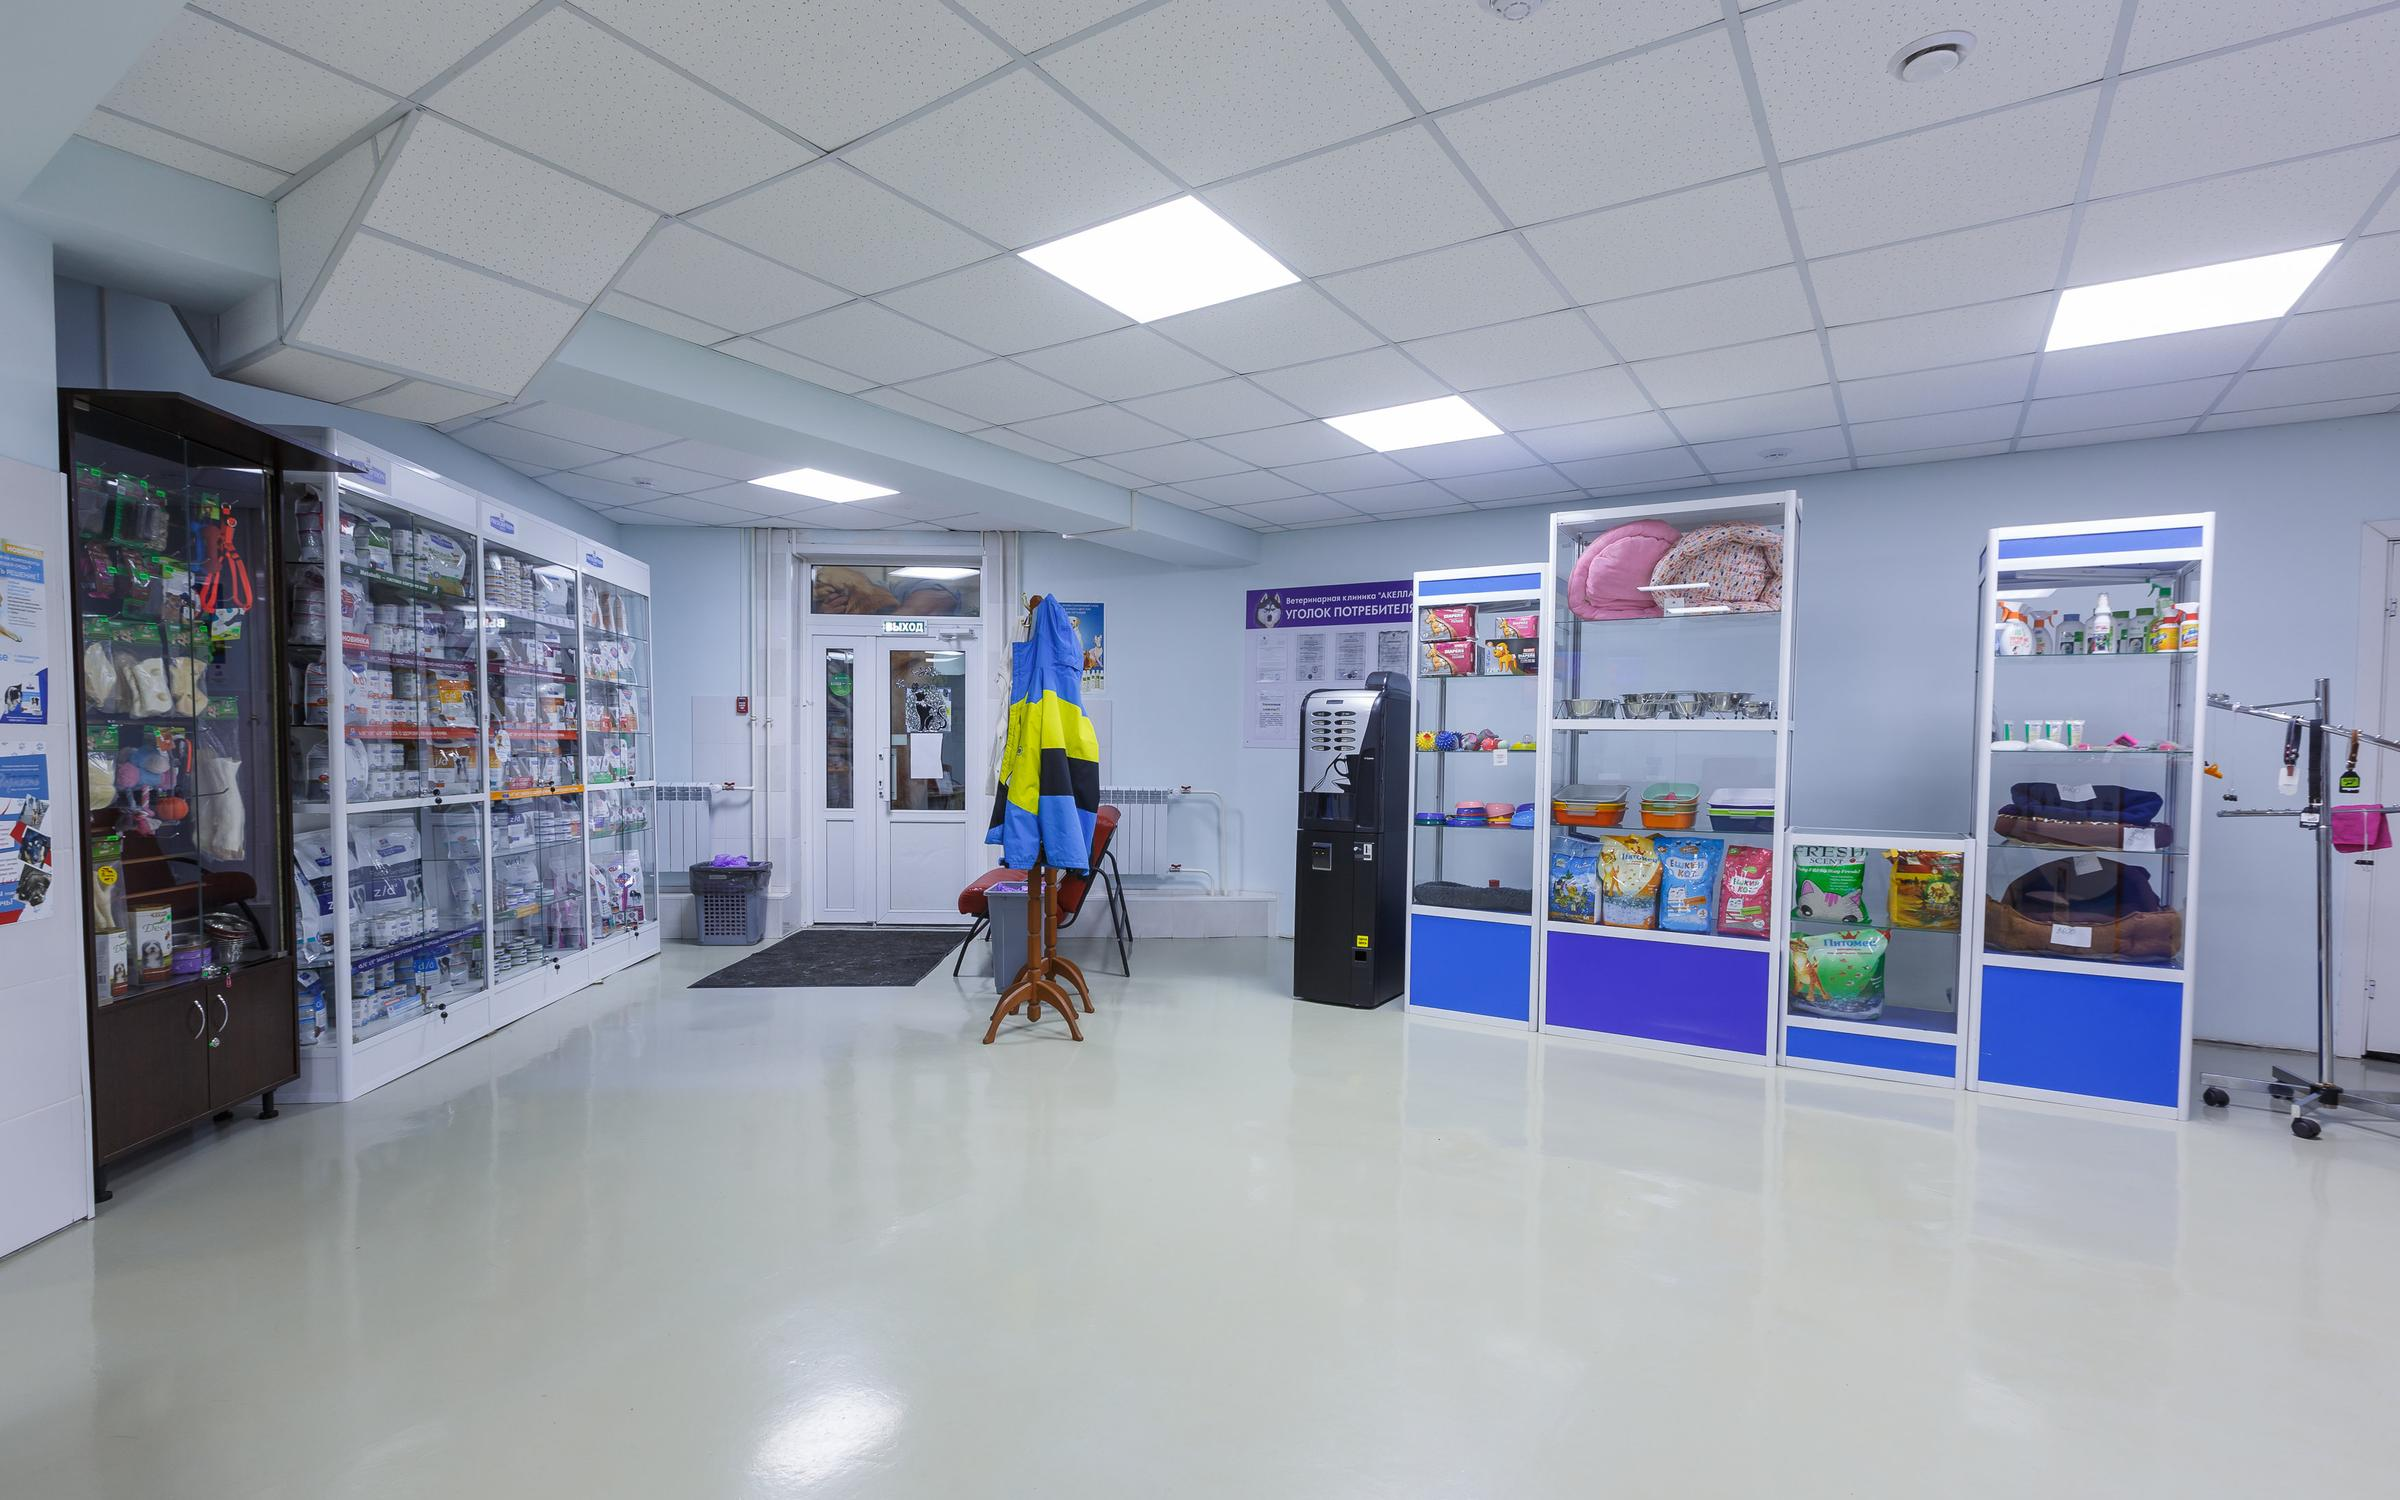 4 городская больница пенза стационар